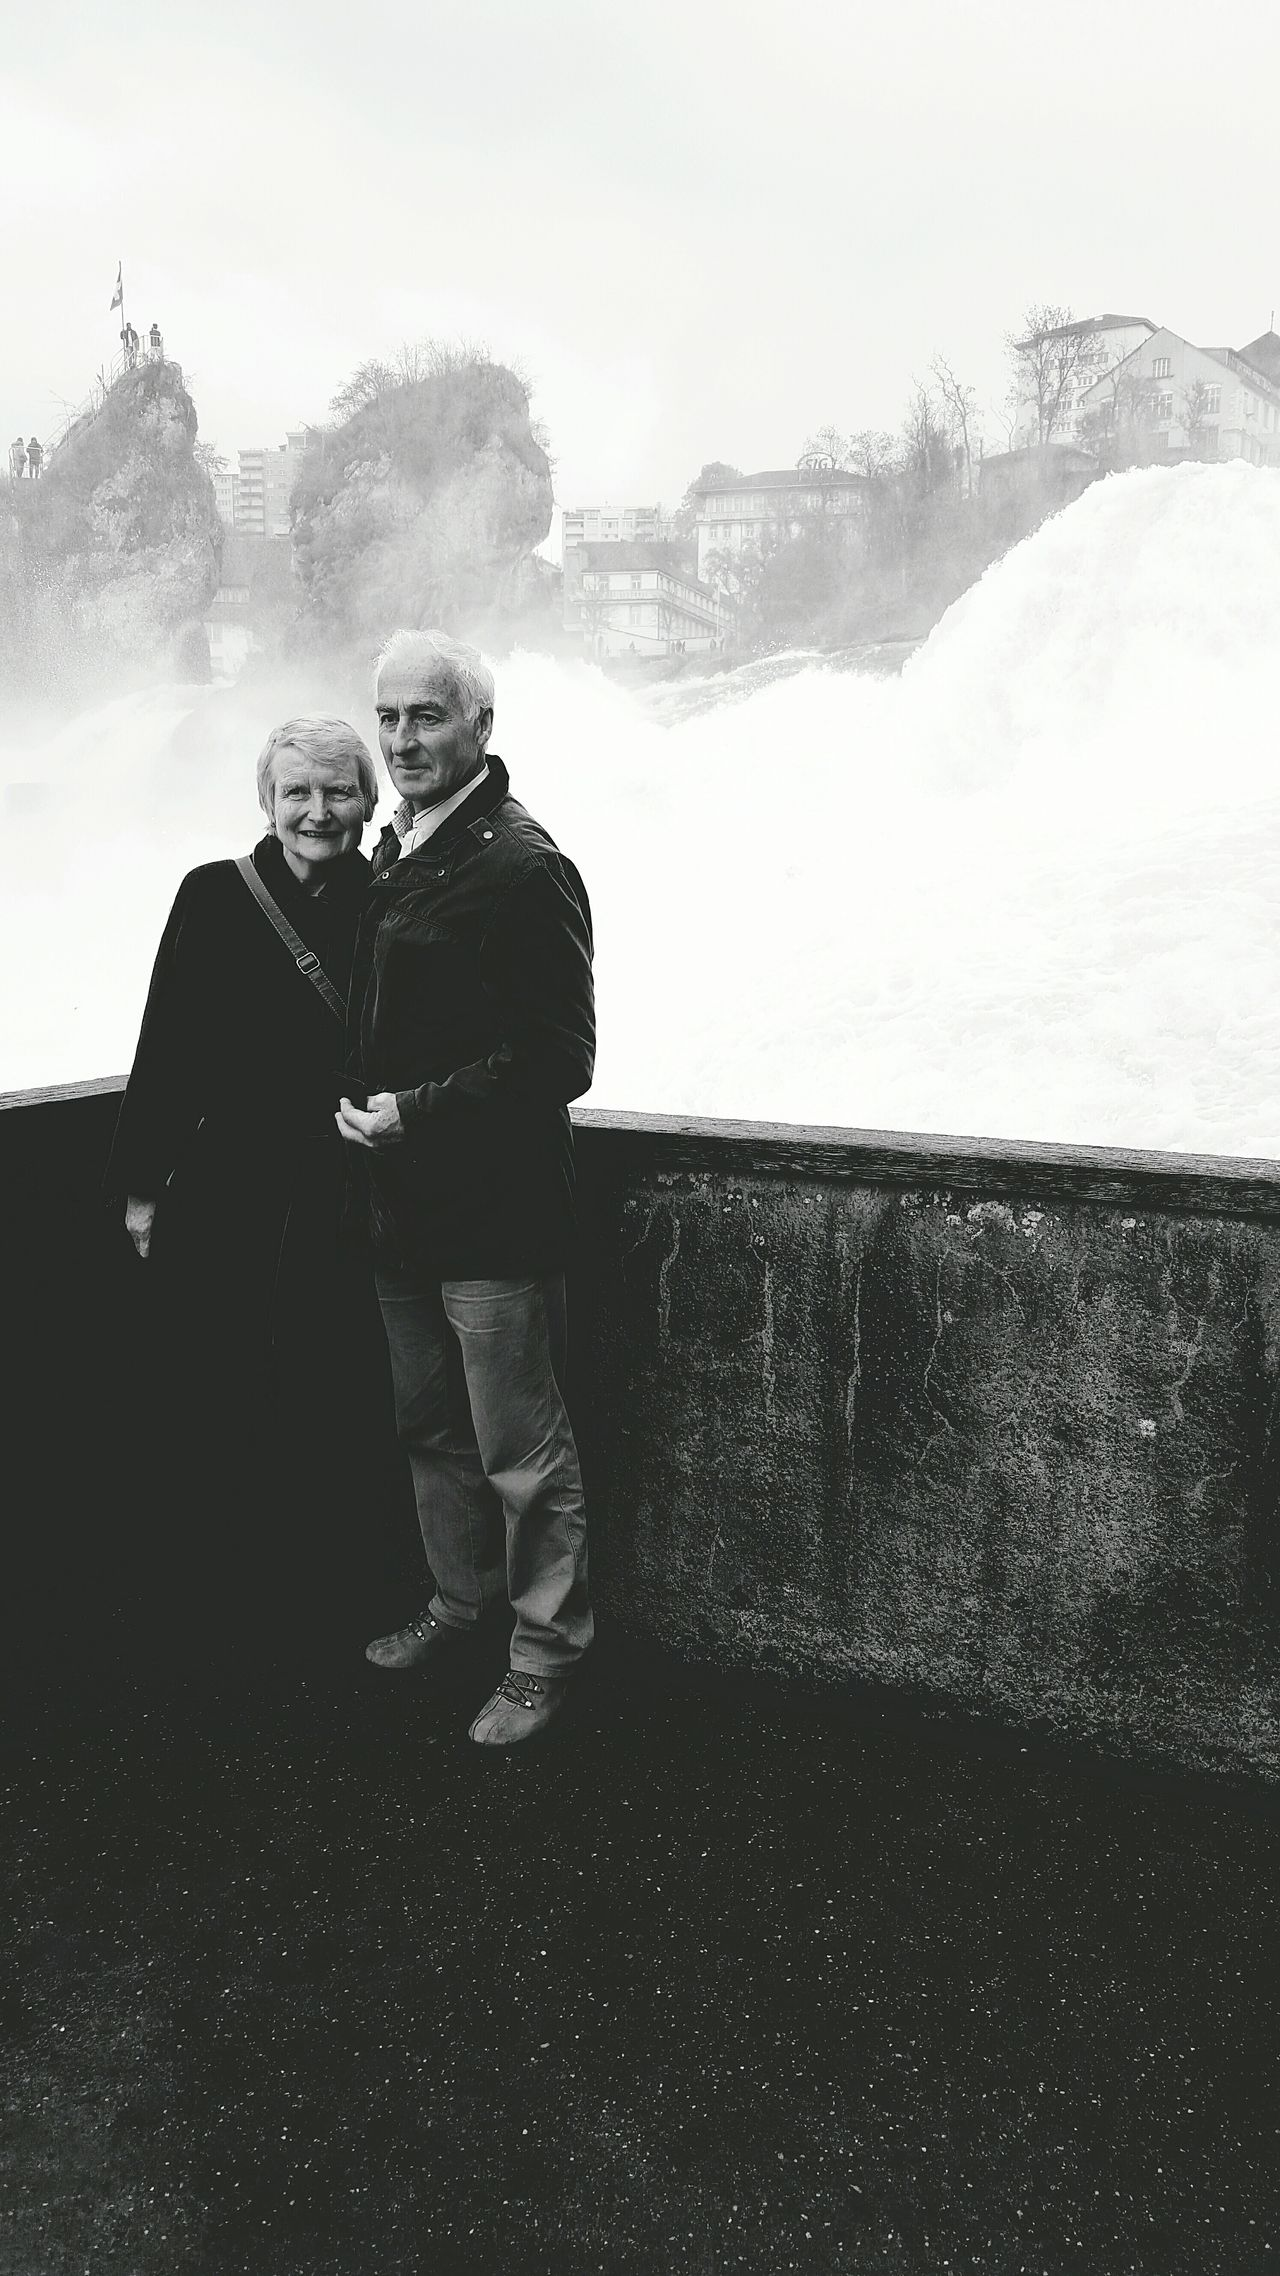 Rheinfall Couple Posing Relationship Seniors Schweizerin Peoplewatching